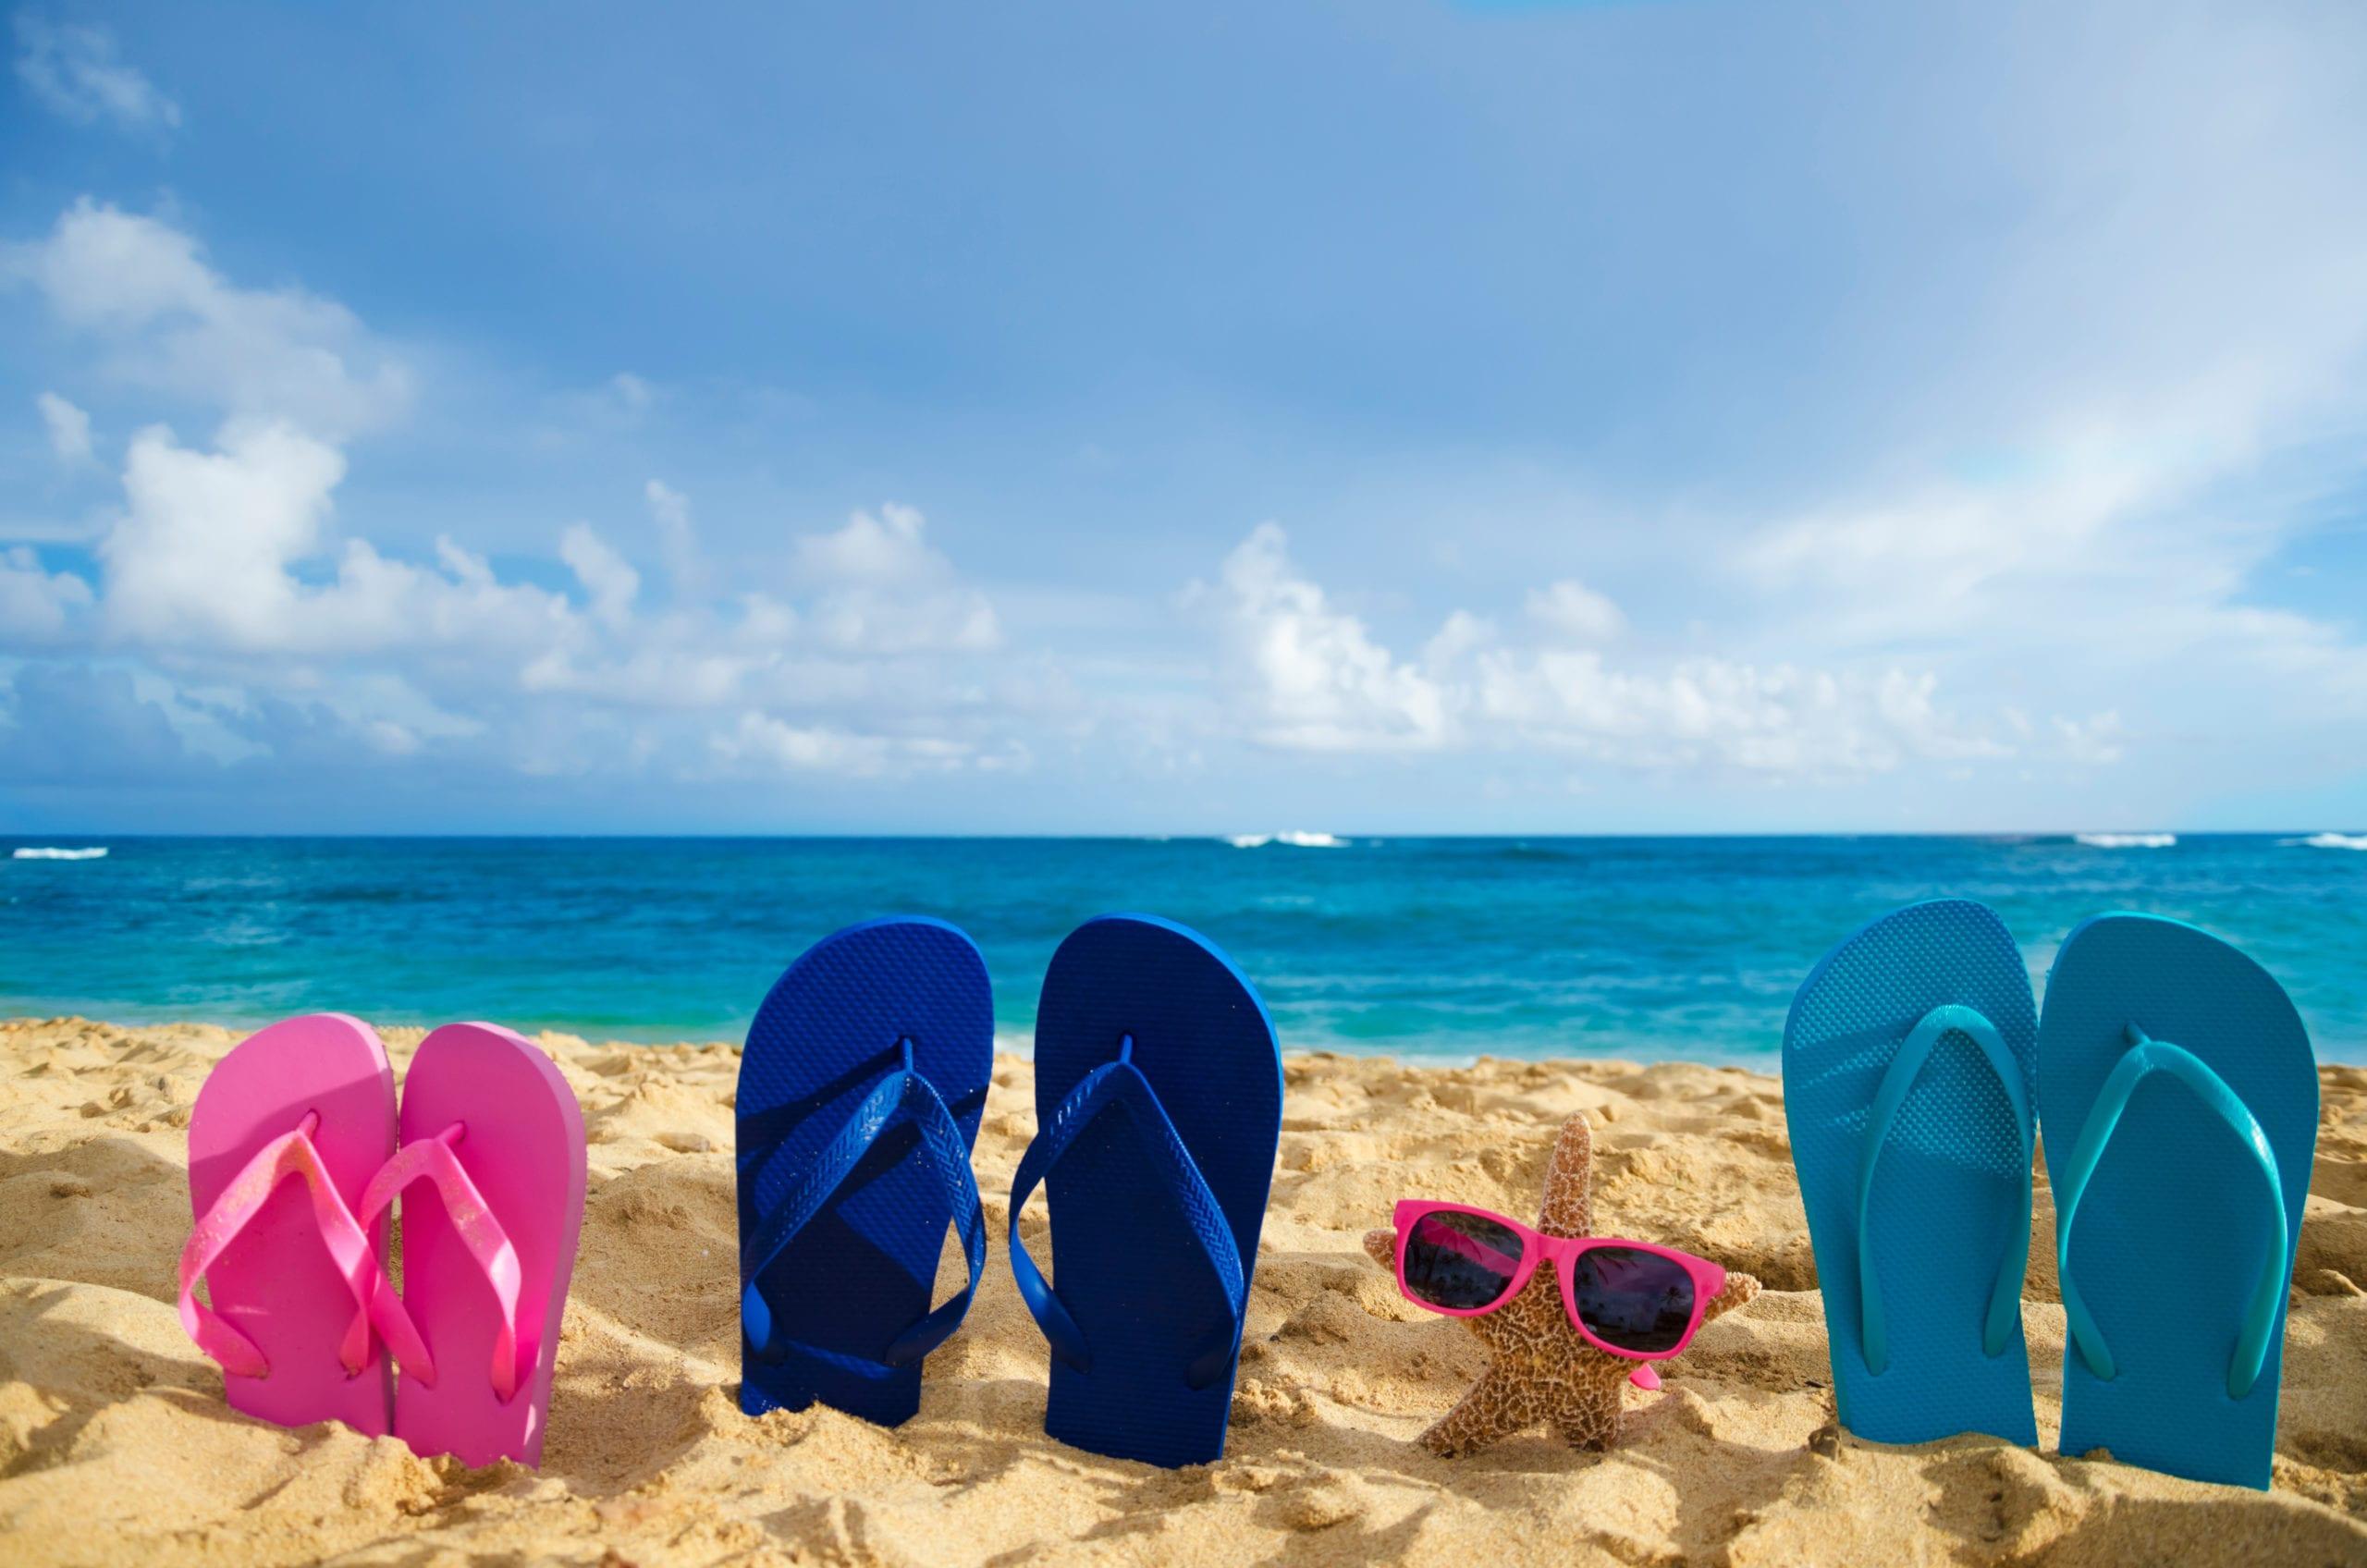 Sandals on beach (Photo: Shutterstock)